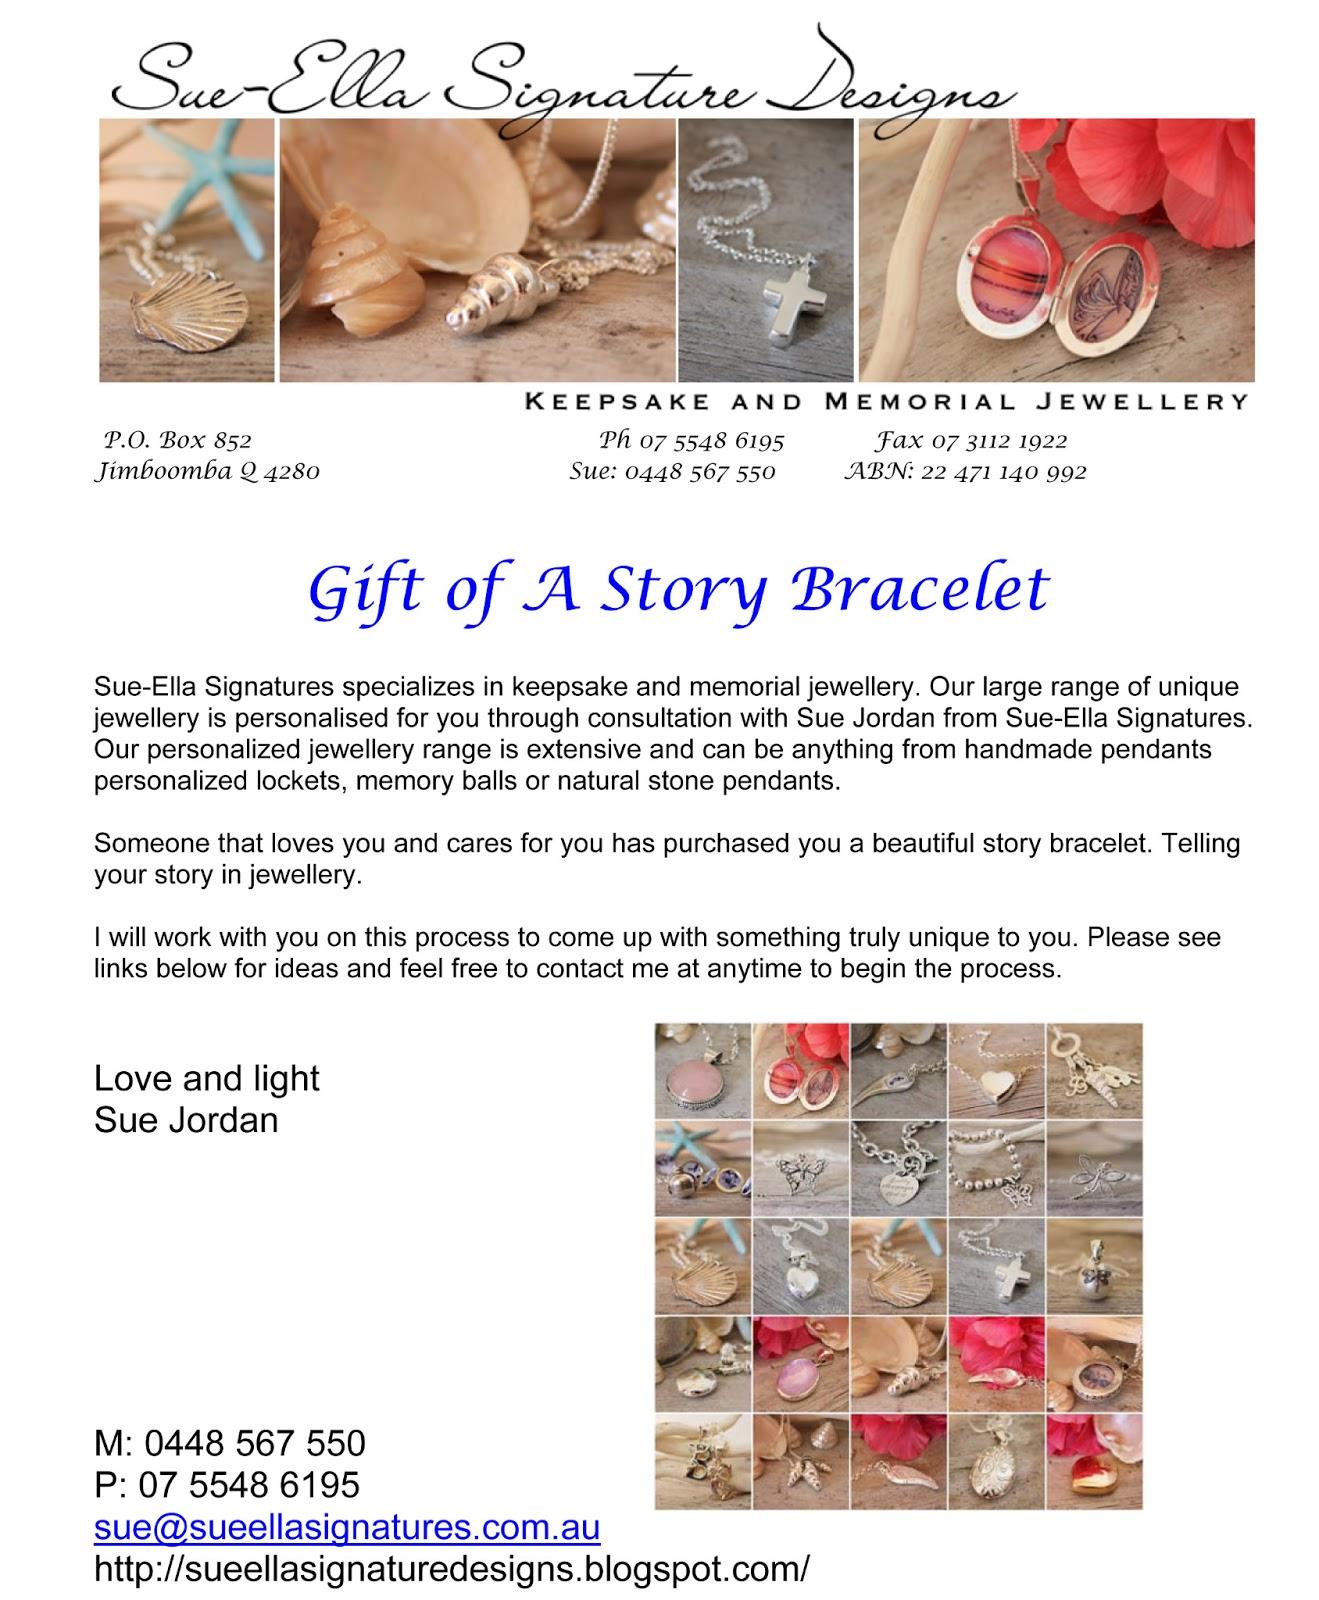 sue ella signature designs personalized gift certificates available